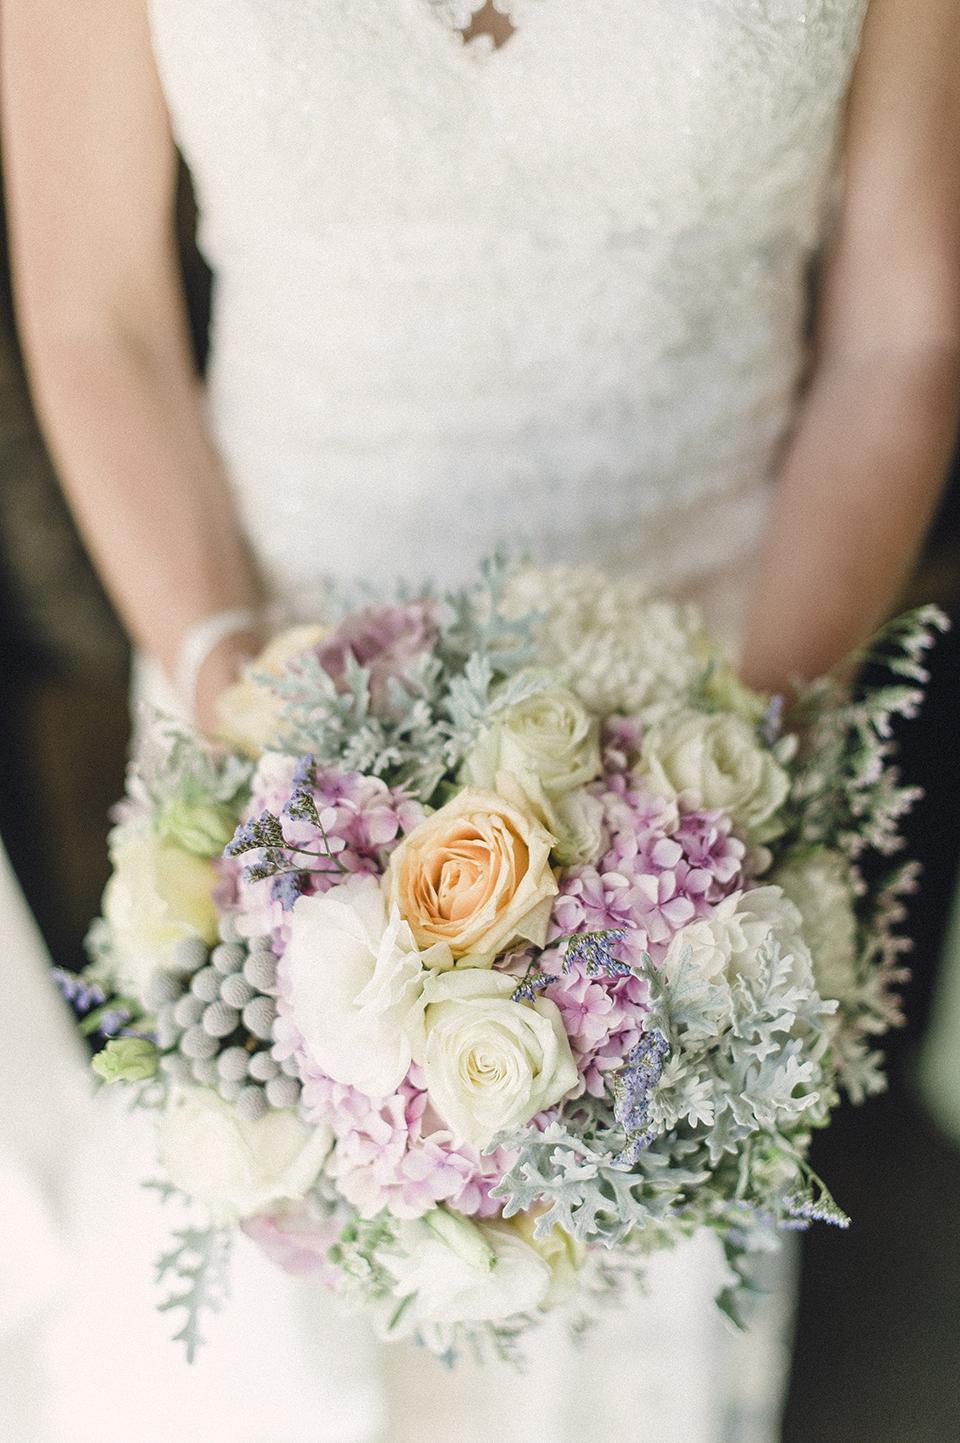 RyanParker_WeddingPhotographer_FineArt_CapeTown_Robertson_PatBusch_Hermanus_M&S_DSC_2961.jpg